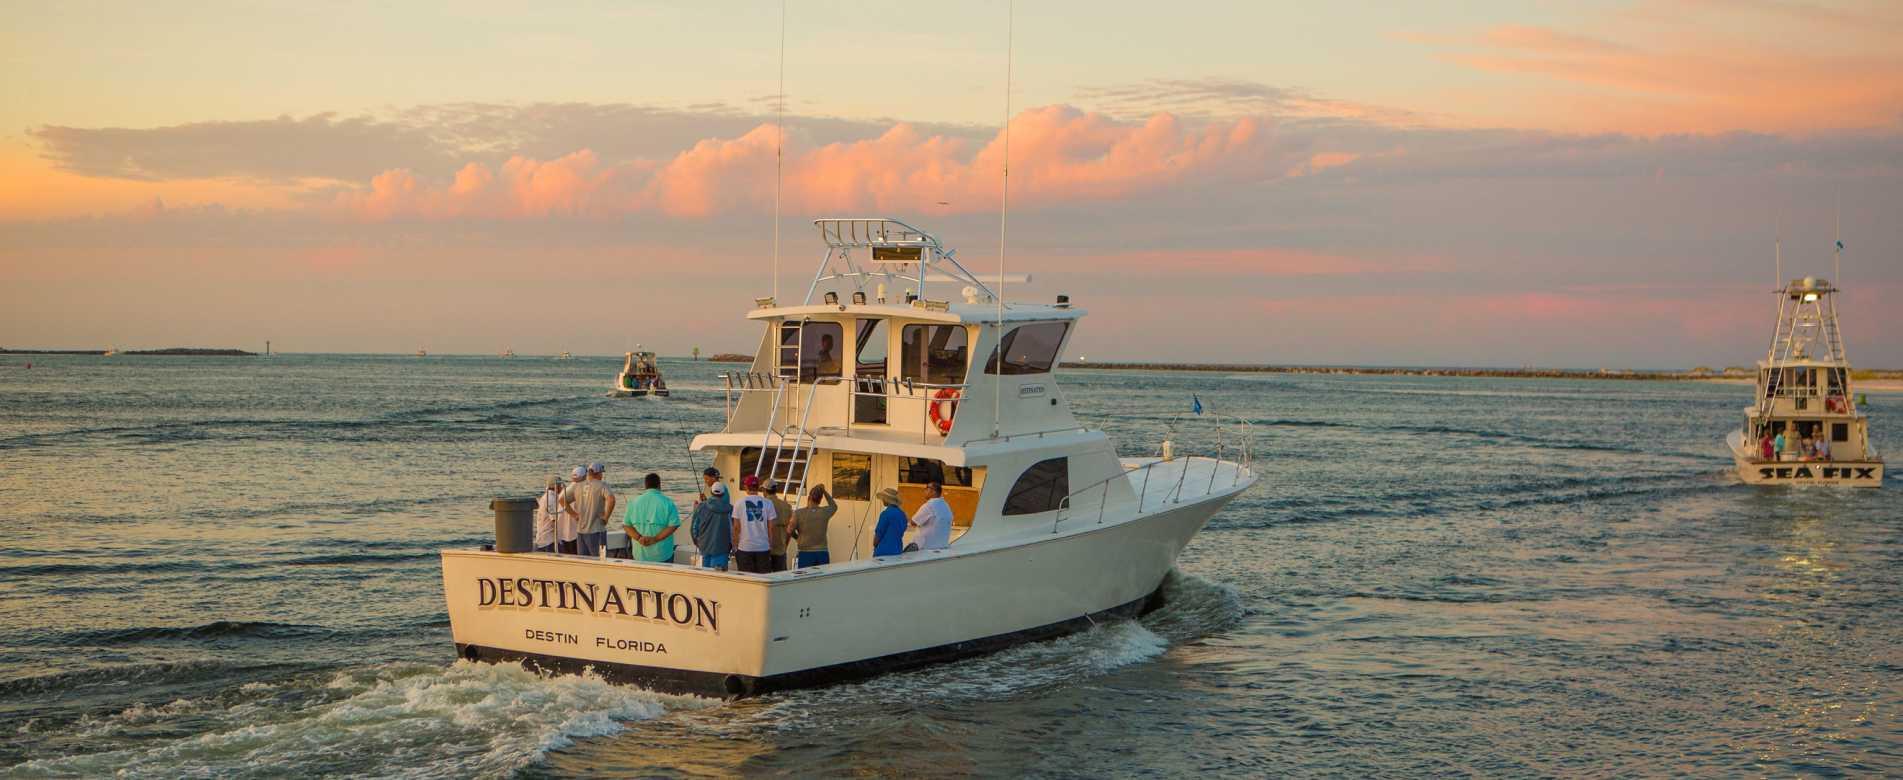 Gulf of Mexico Fishing | Florida's Emerald Coast | Florida's Emerald